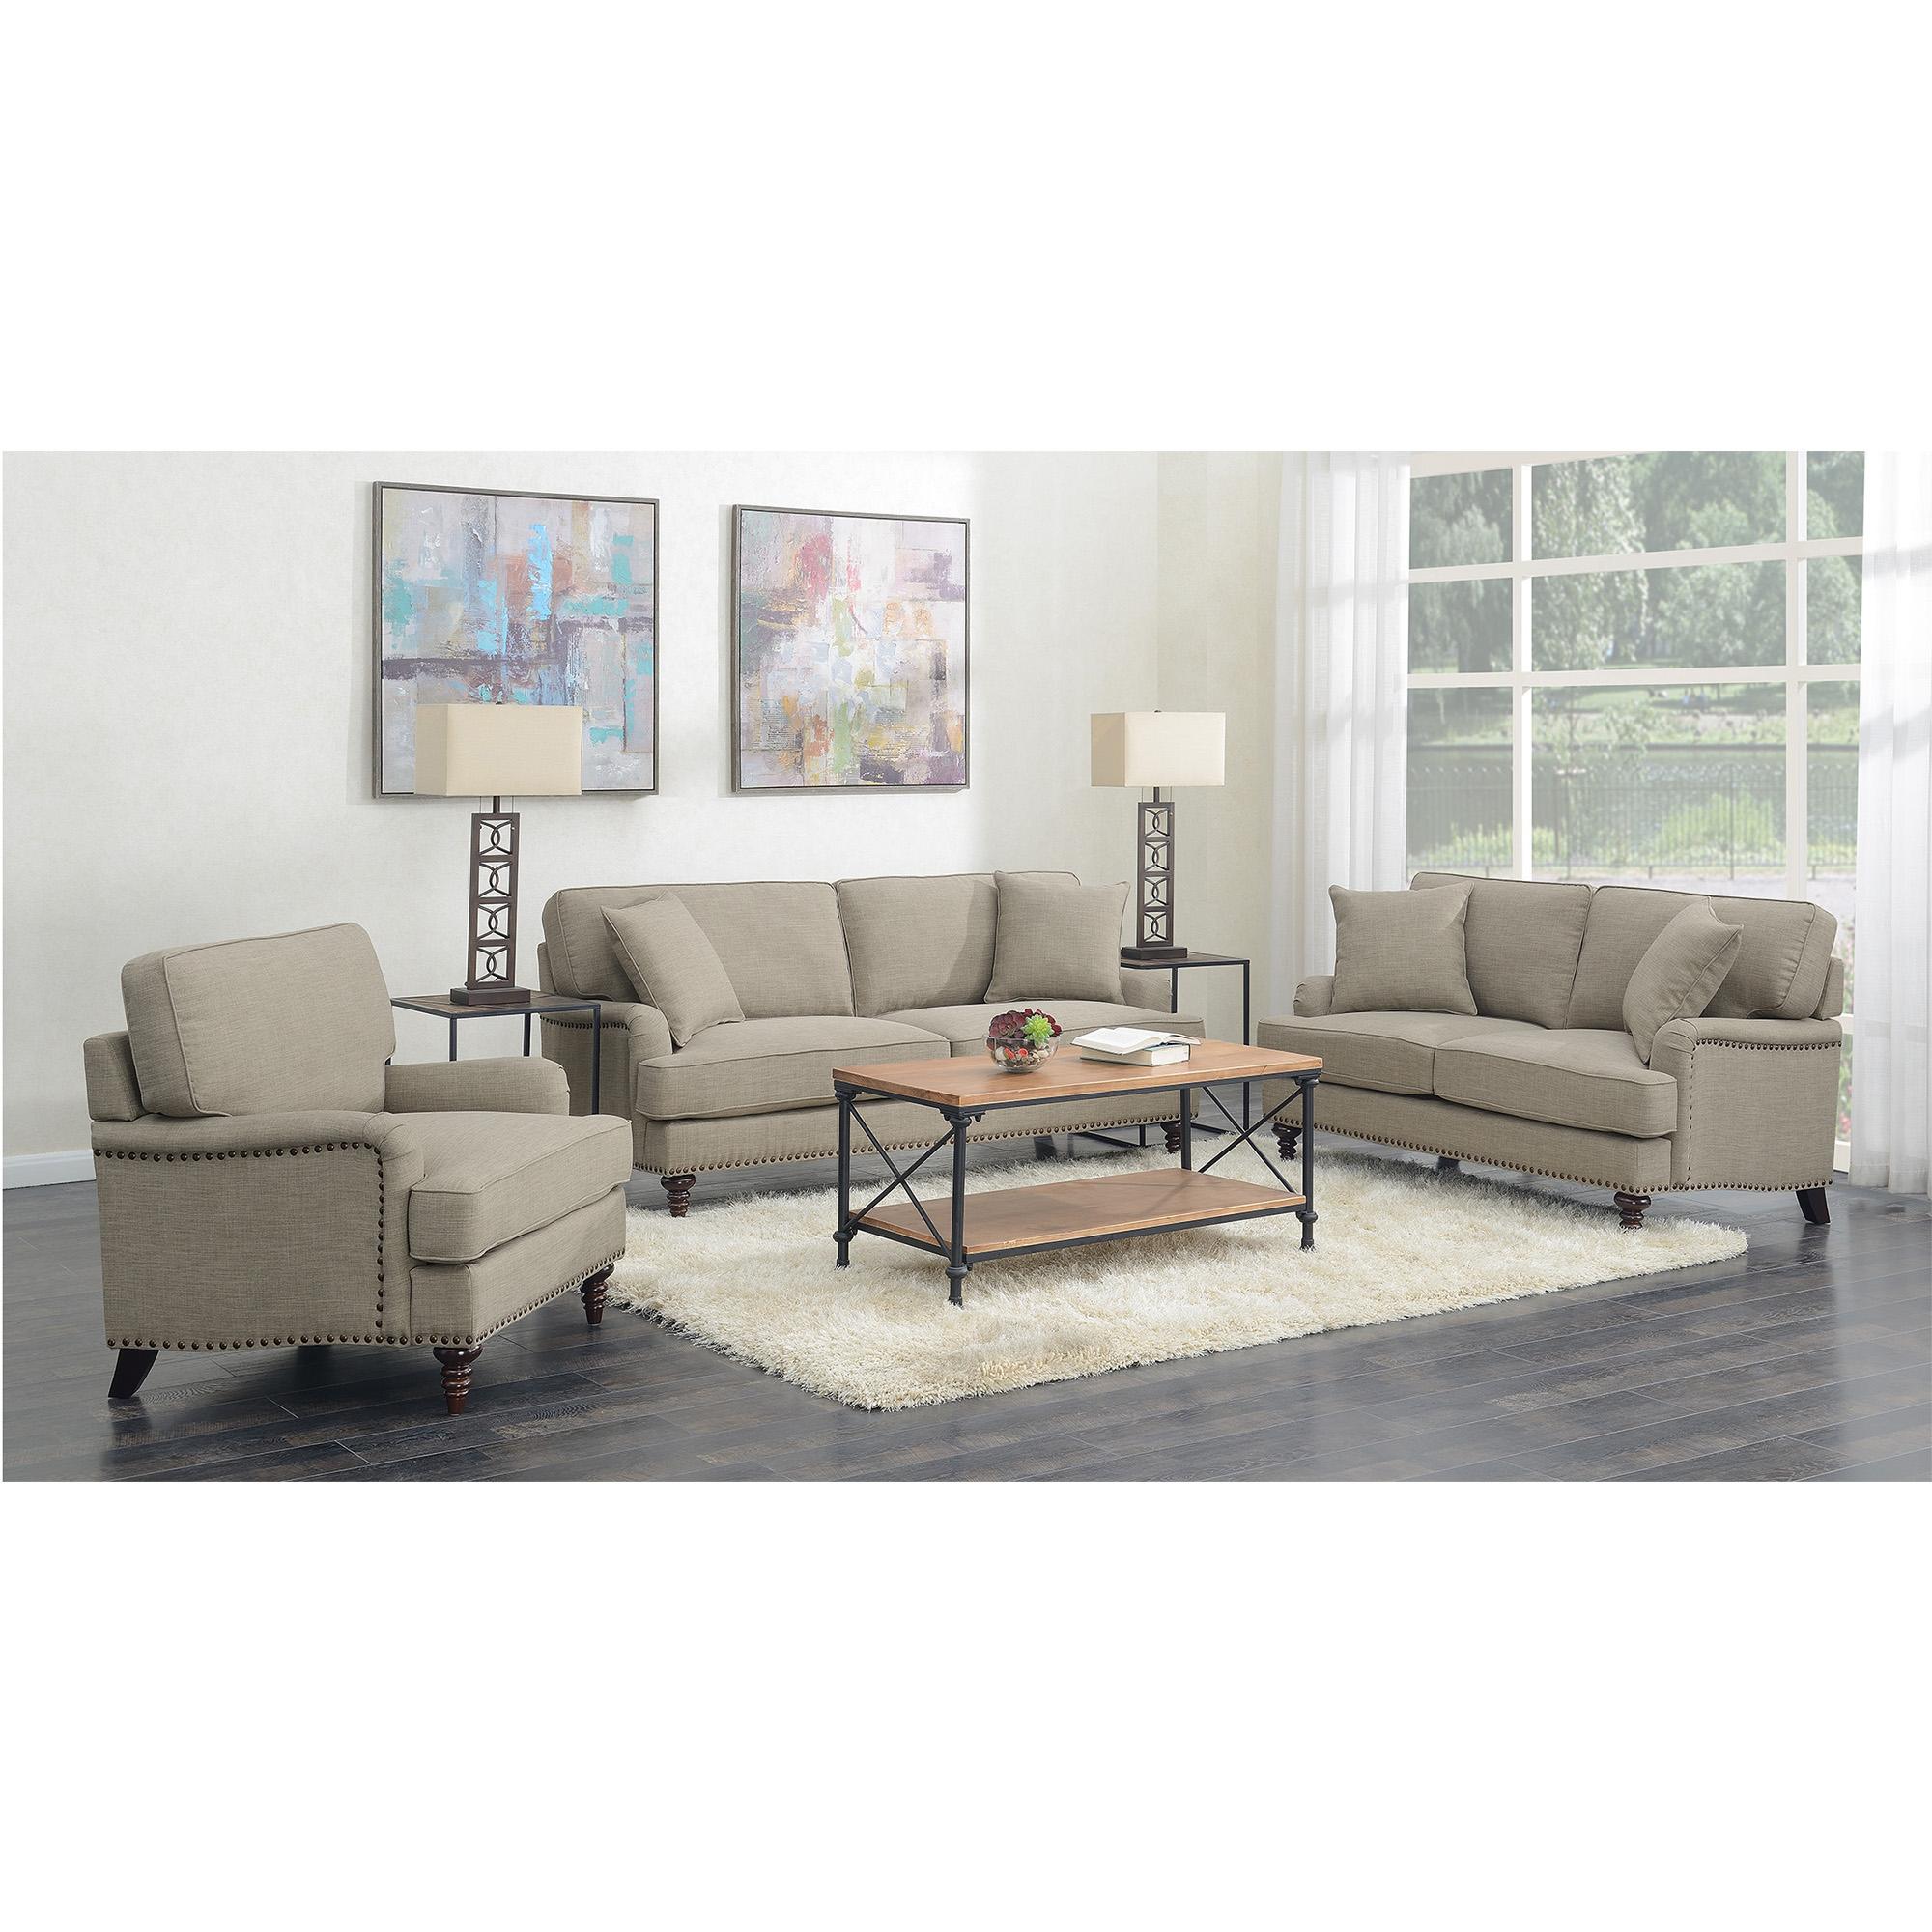 Picket House Living Room Set Sofa Loveseat Chair Smoke